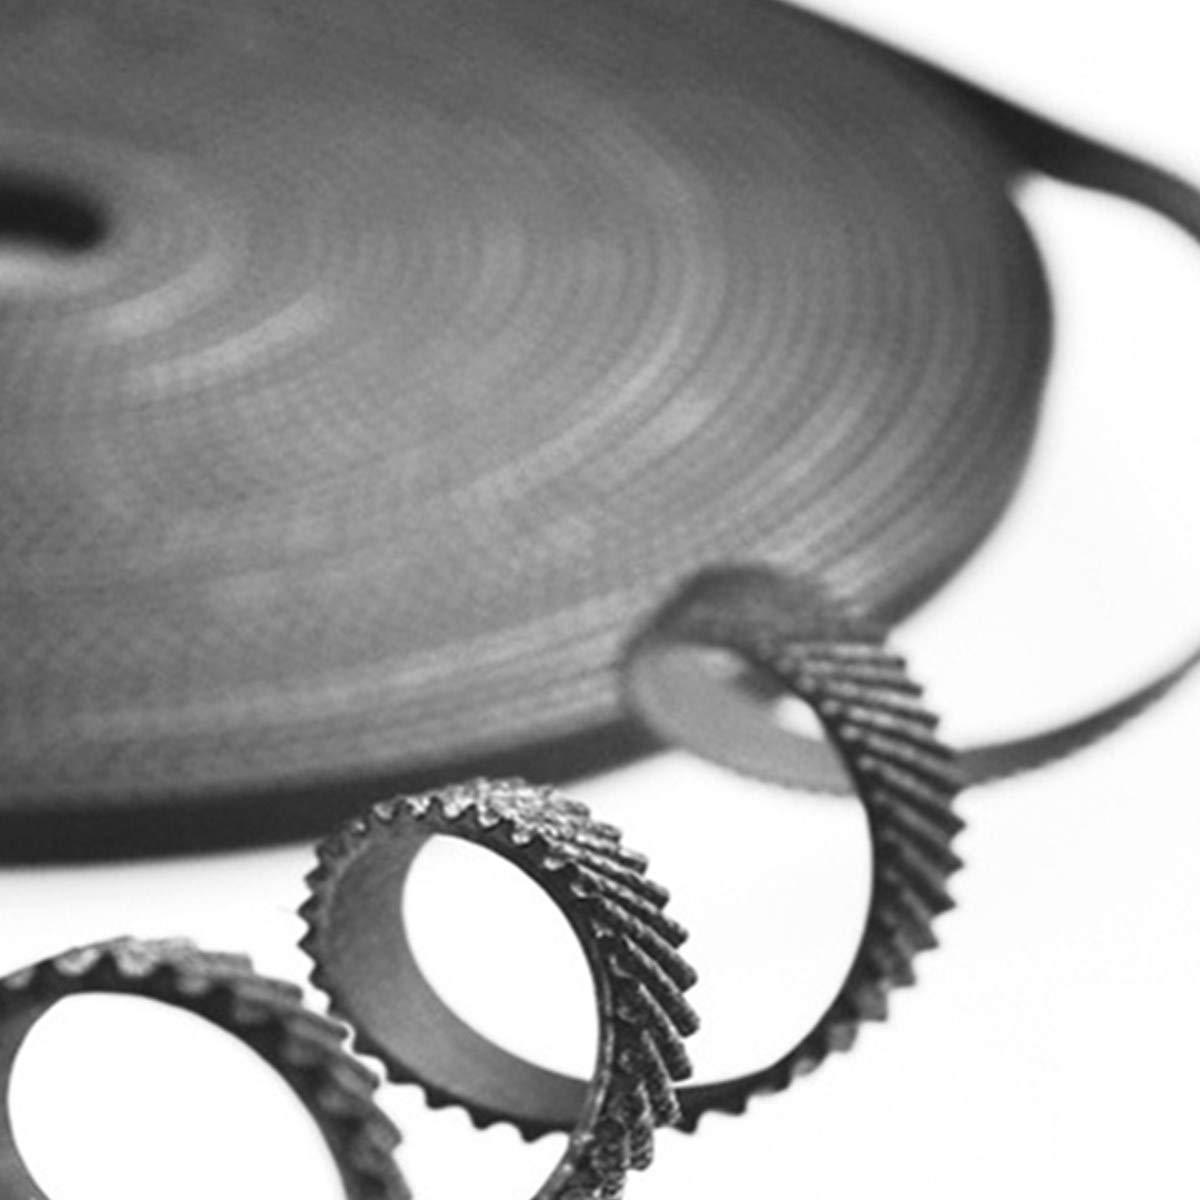 5 Meters 3D Printer Timing Belt 16.4 Ft Length Open GT2 Timing Belt 6mm Width Suitable for 3D Printers CNC Machine